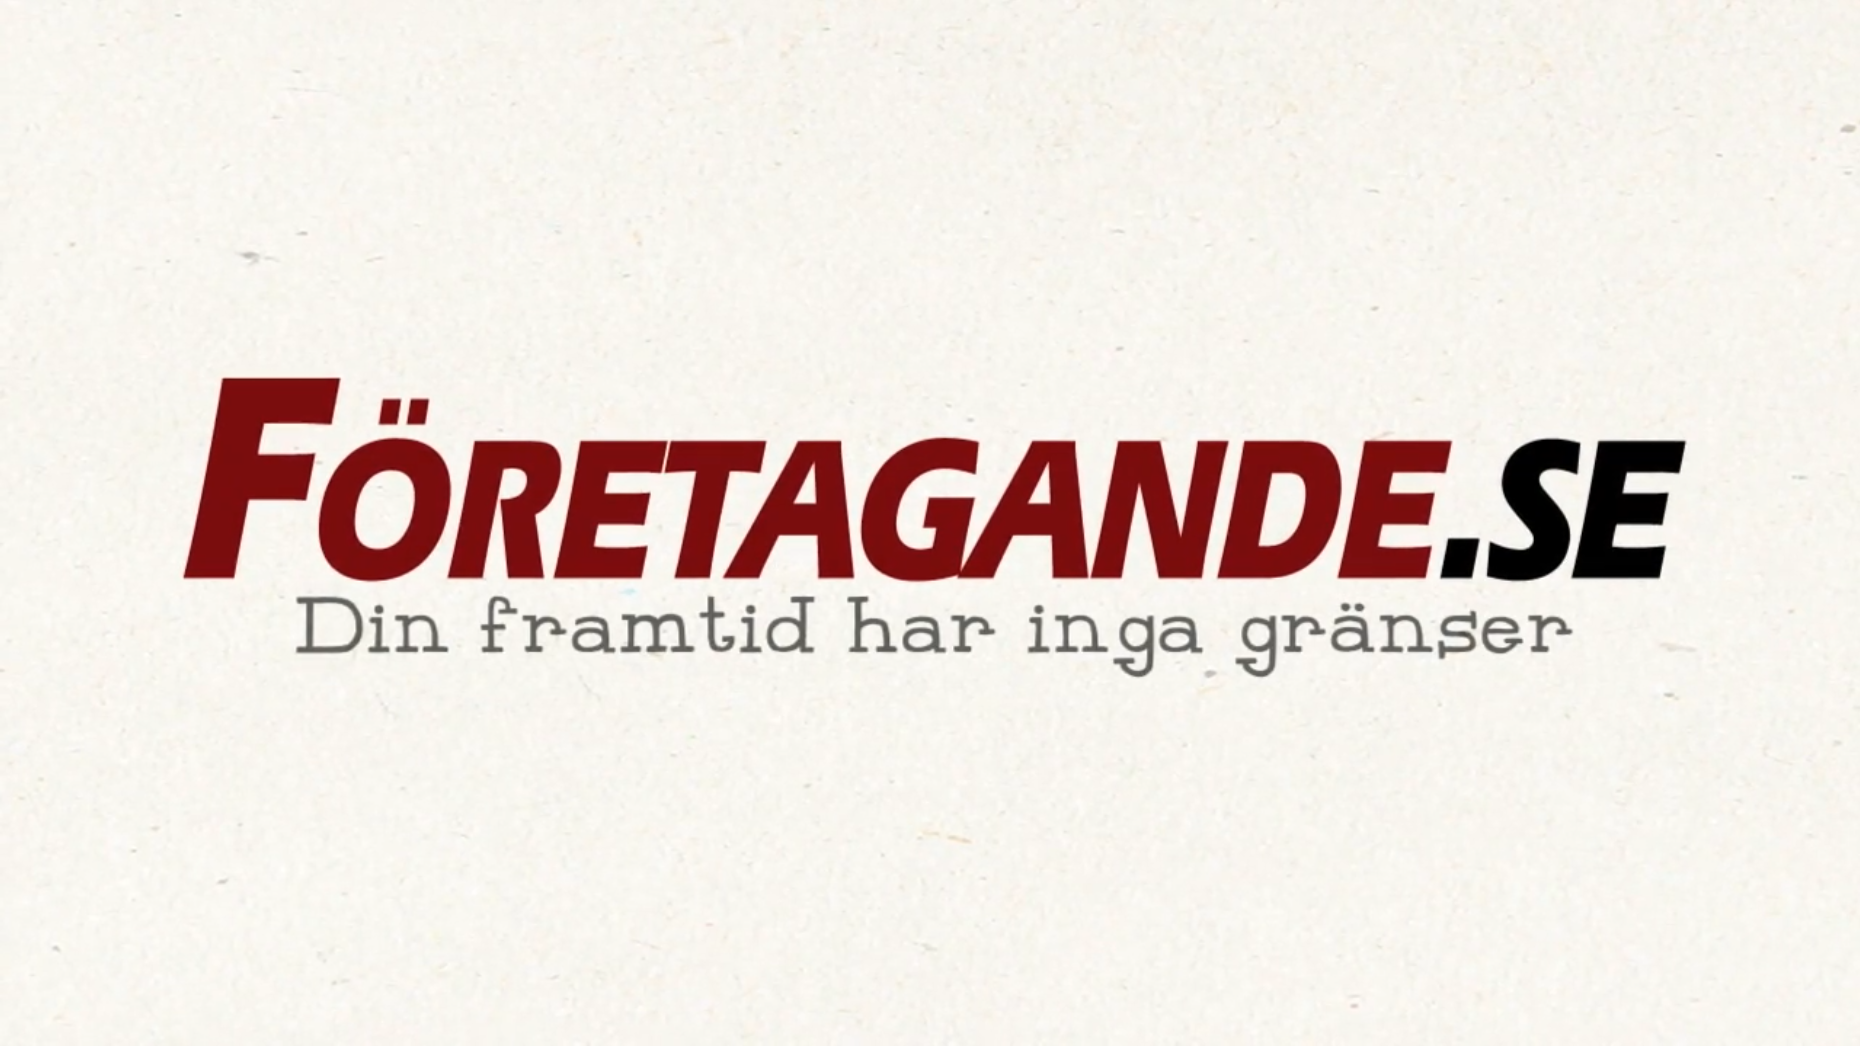 Commercial Voiceover for företagande.se (Swedish)